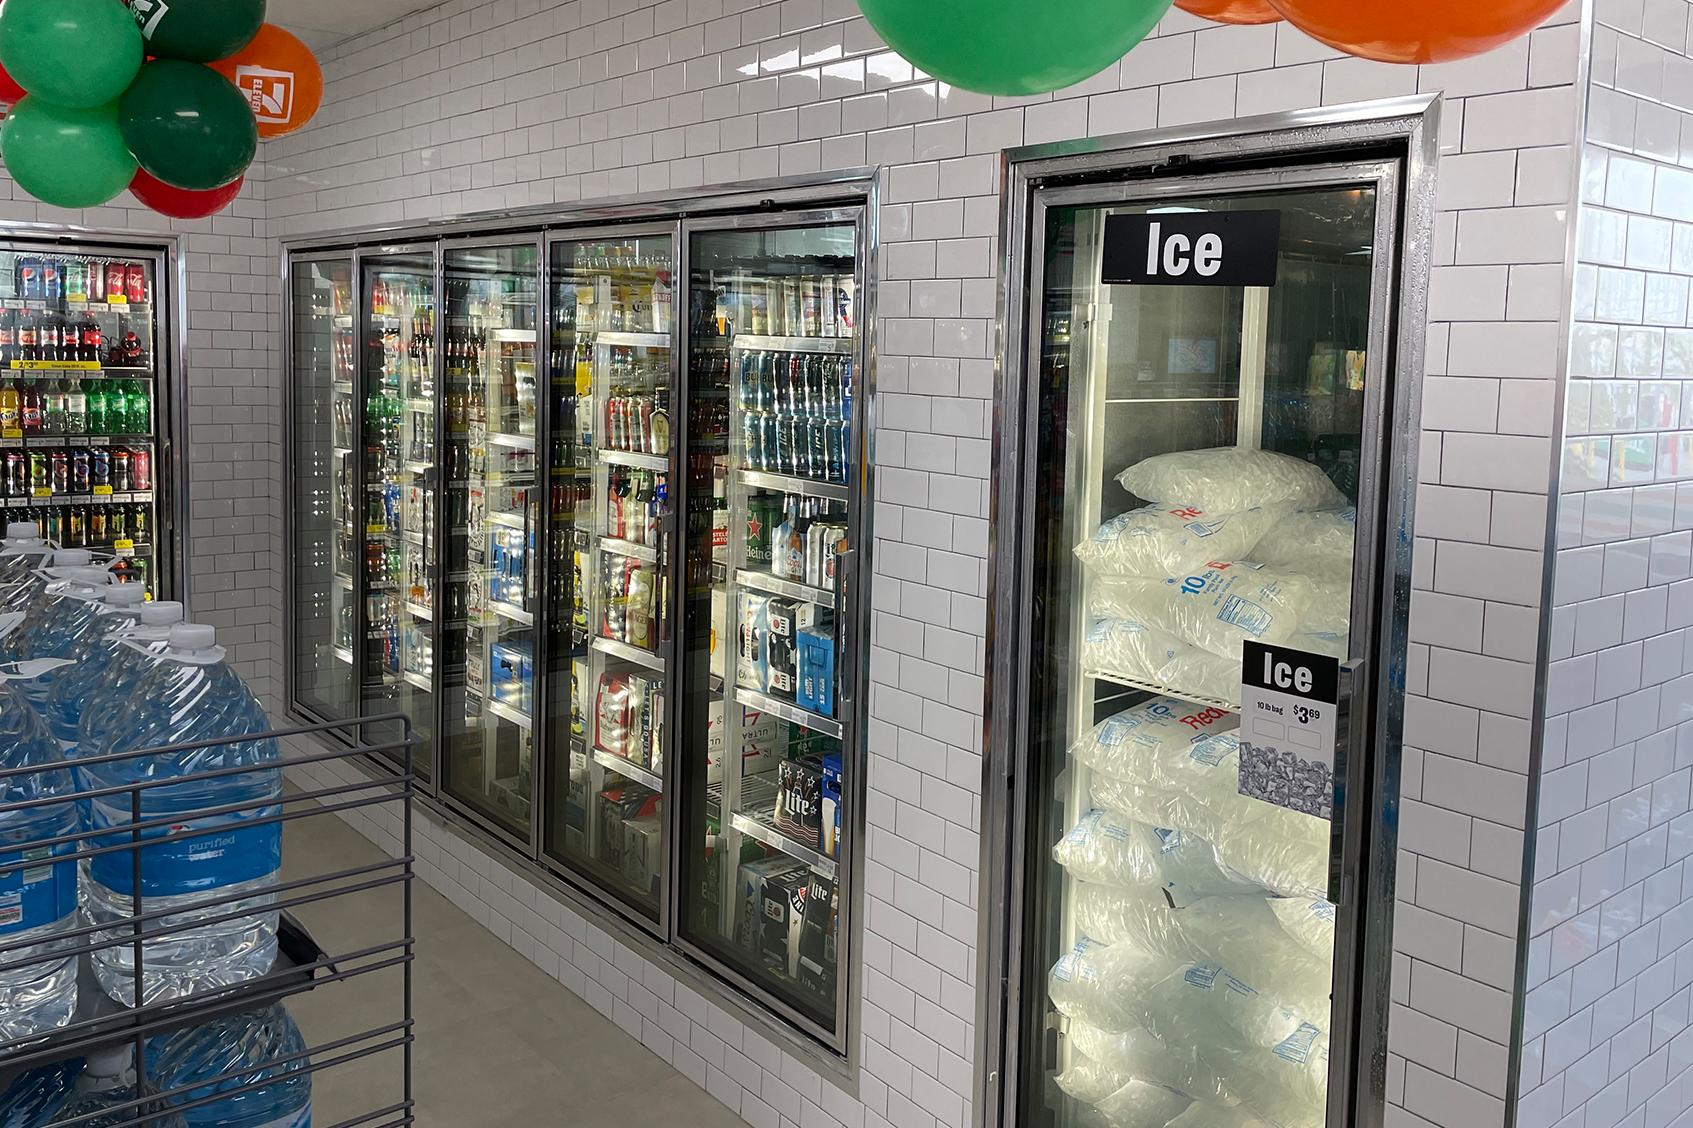 Convenience Store Ice Freezer